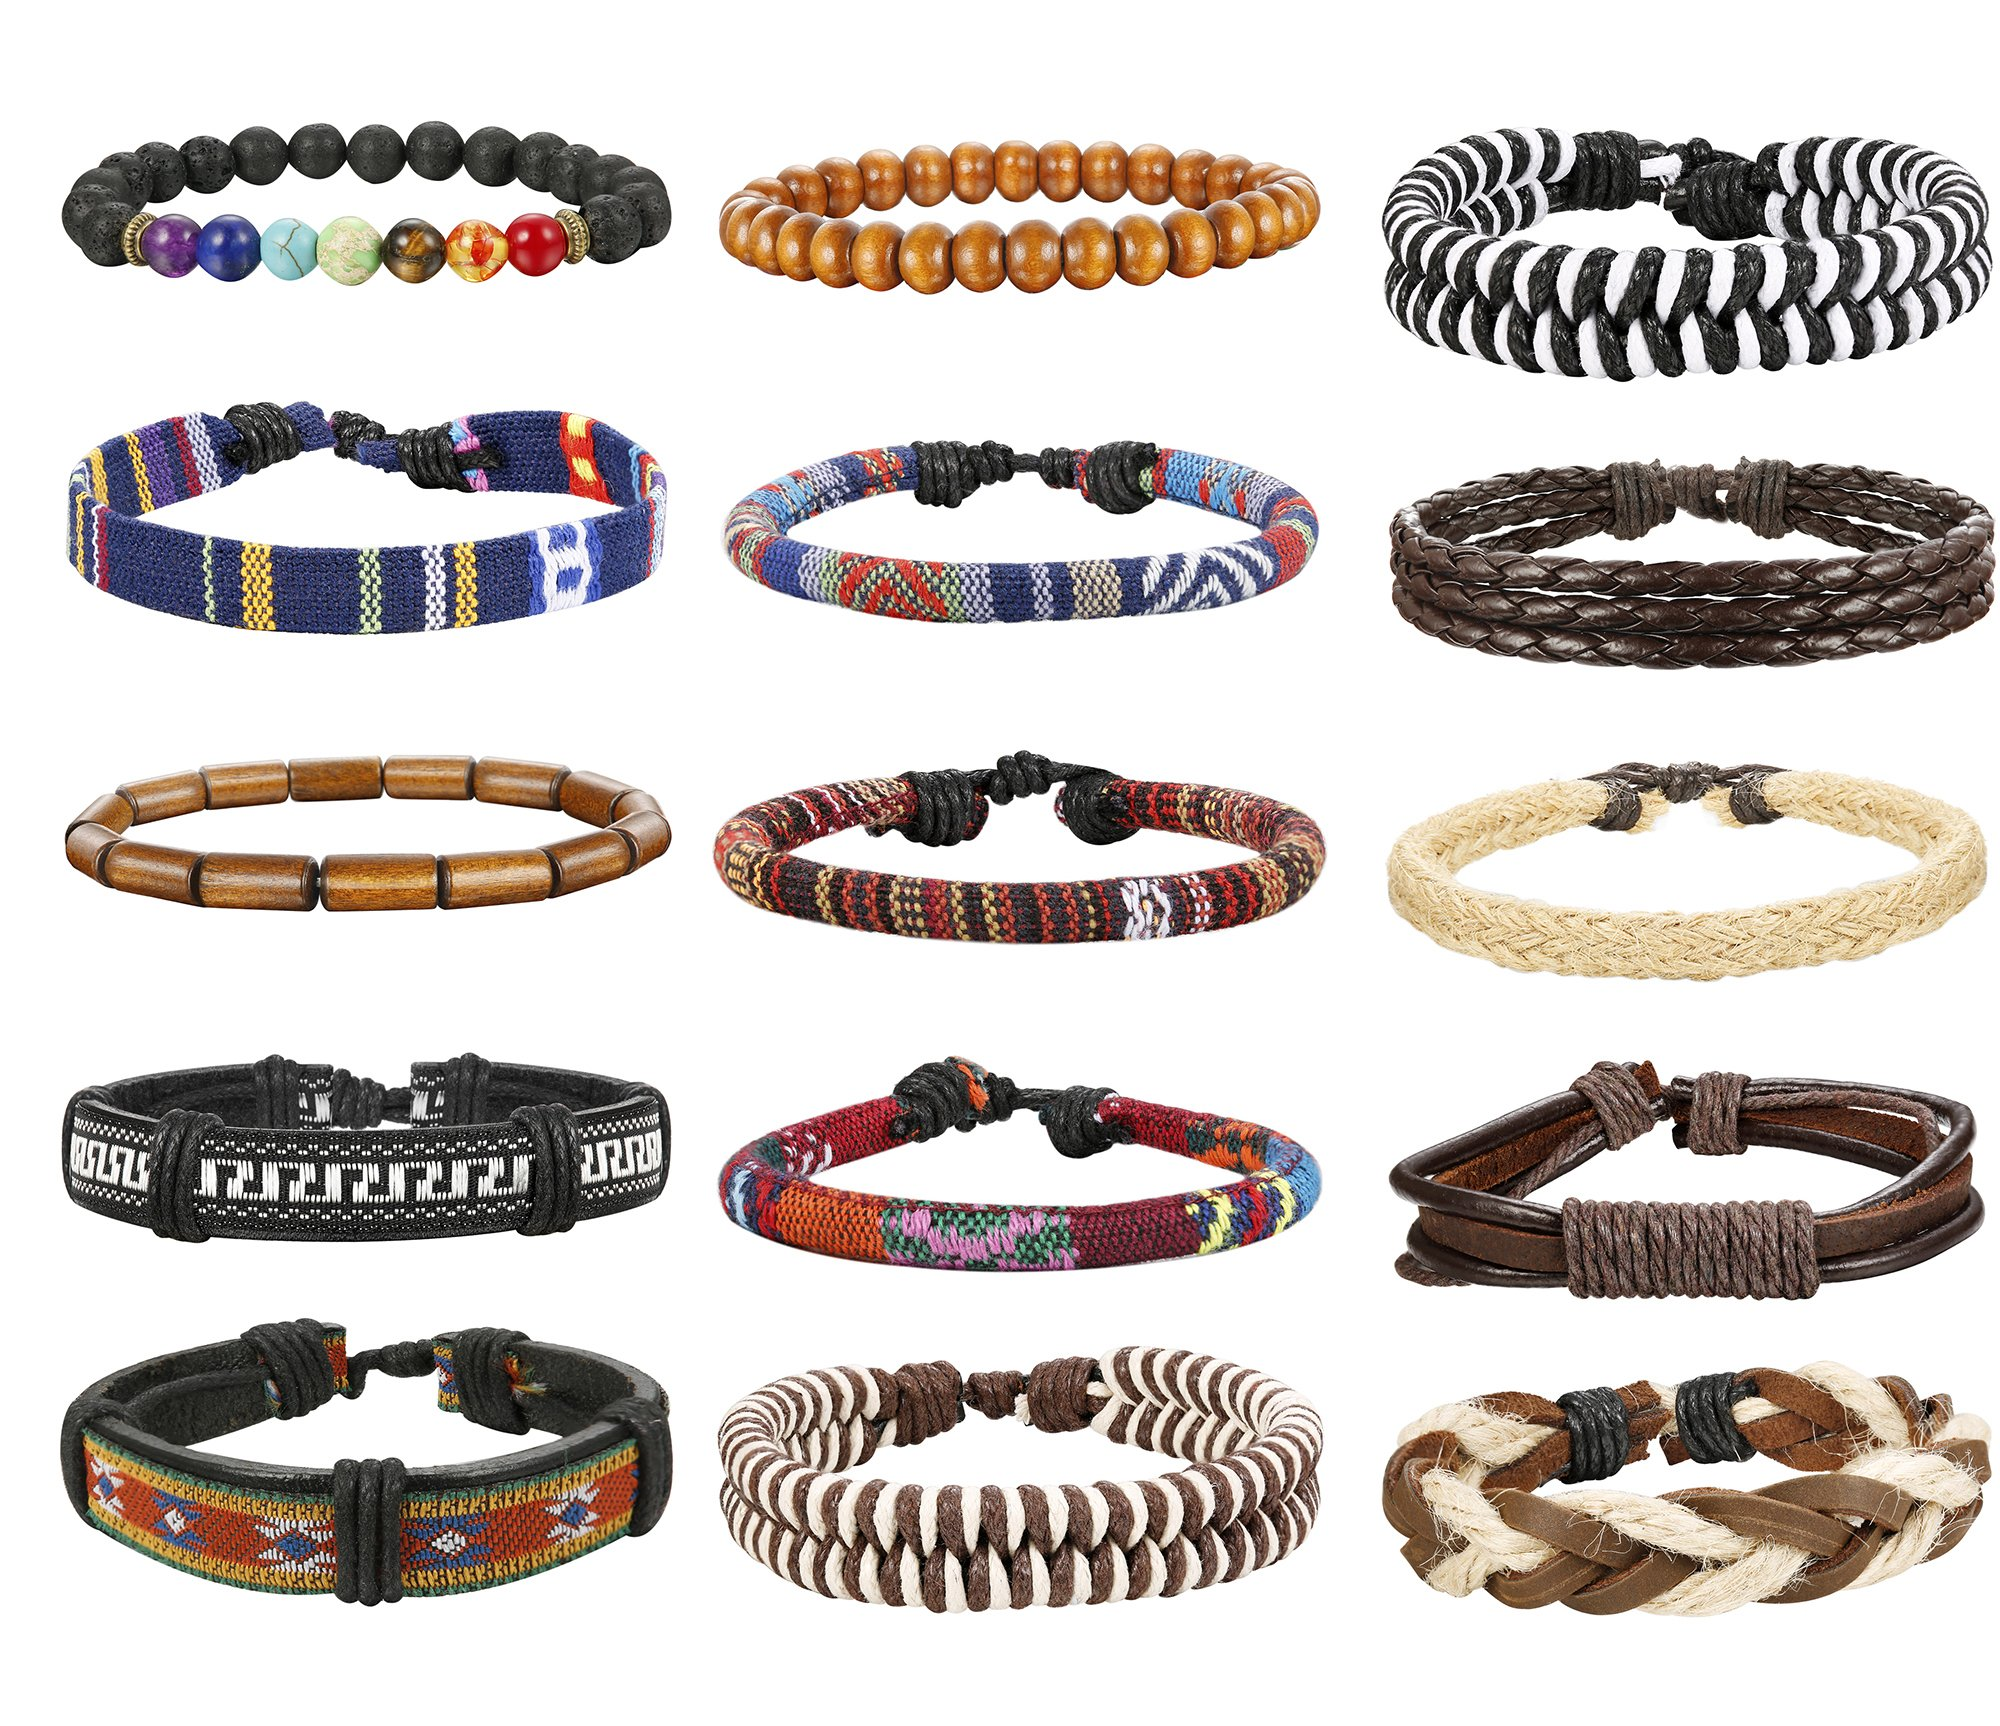 Thunaraz 15Pcs Braided Leather Bracelets for Men Women Natural Stone Wooden Beaded Bracelet Bangle Wrap Adjustable